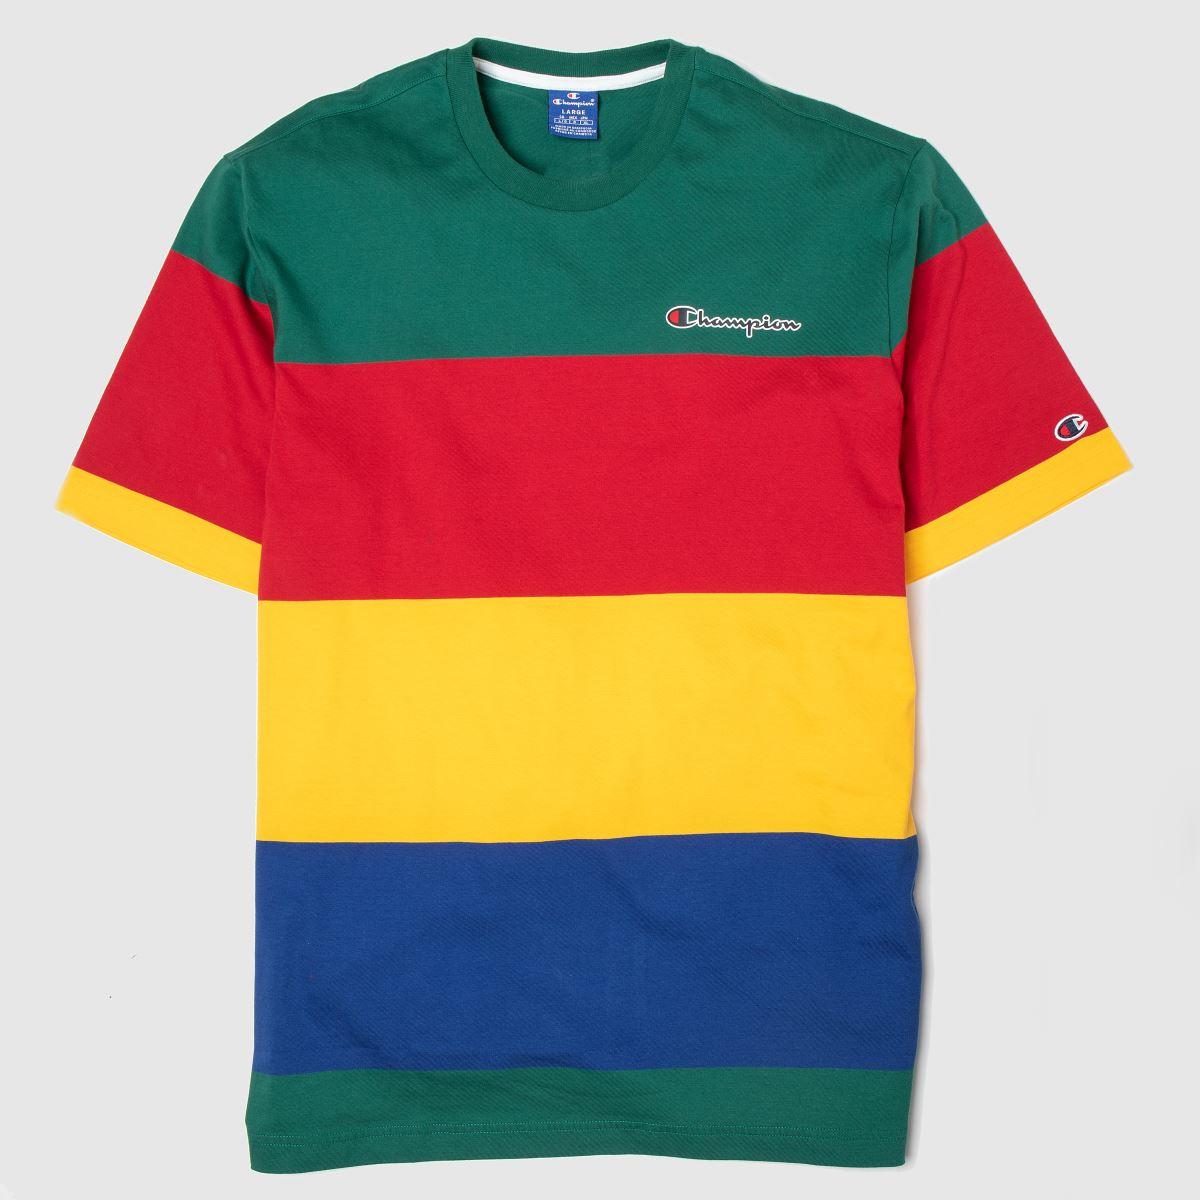 Champion Green & Red Crewneck T-shirt